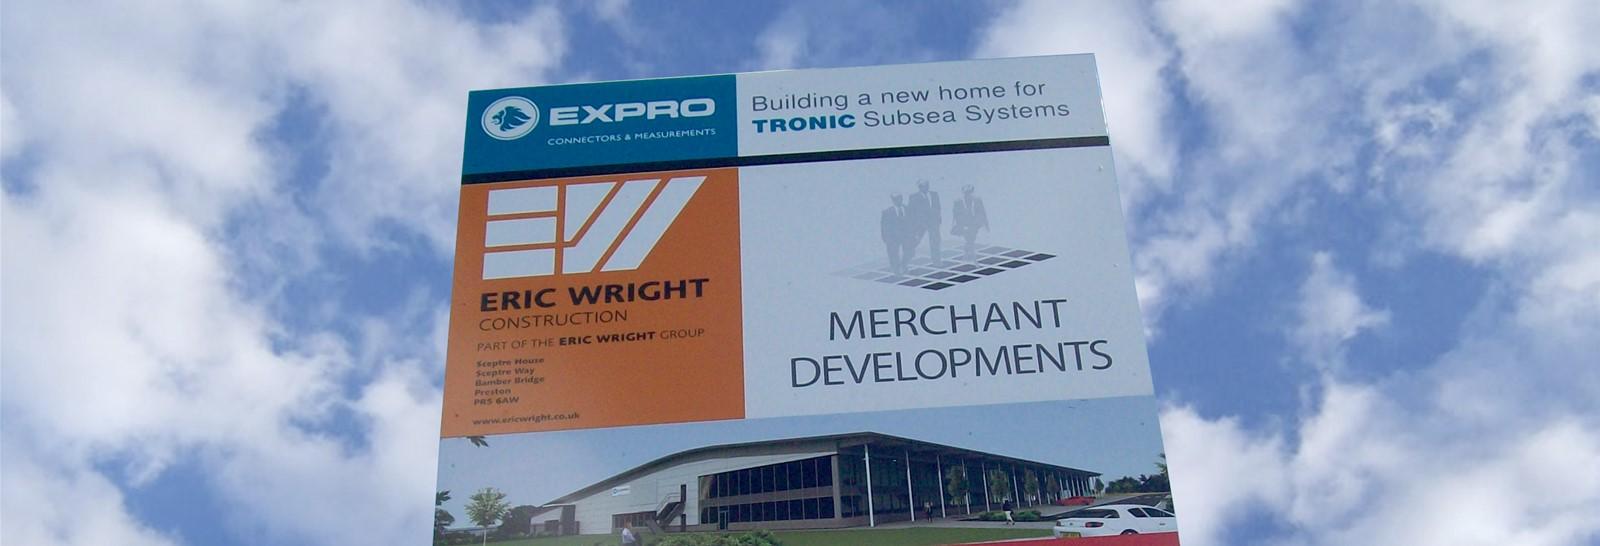 Large construction site signage